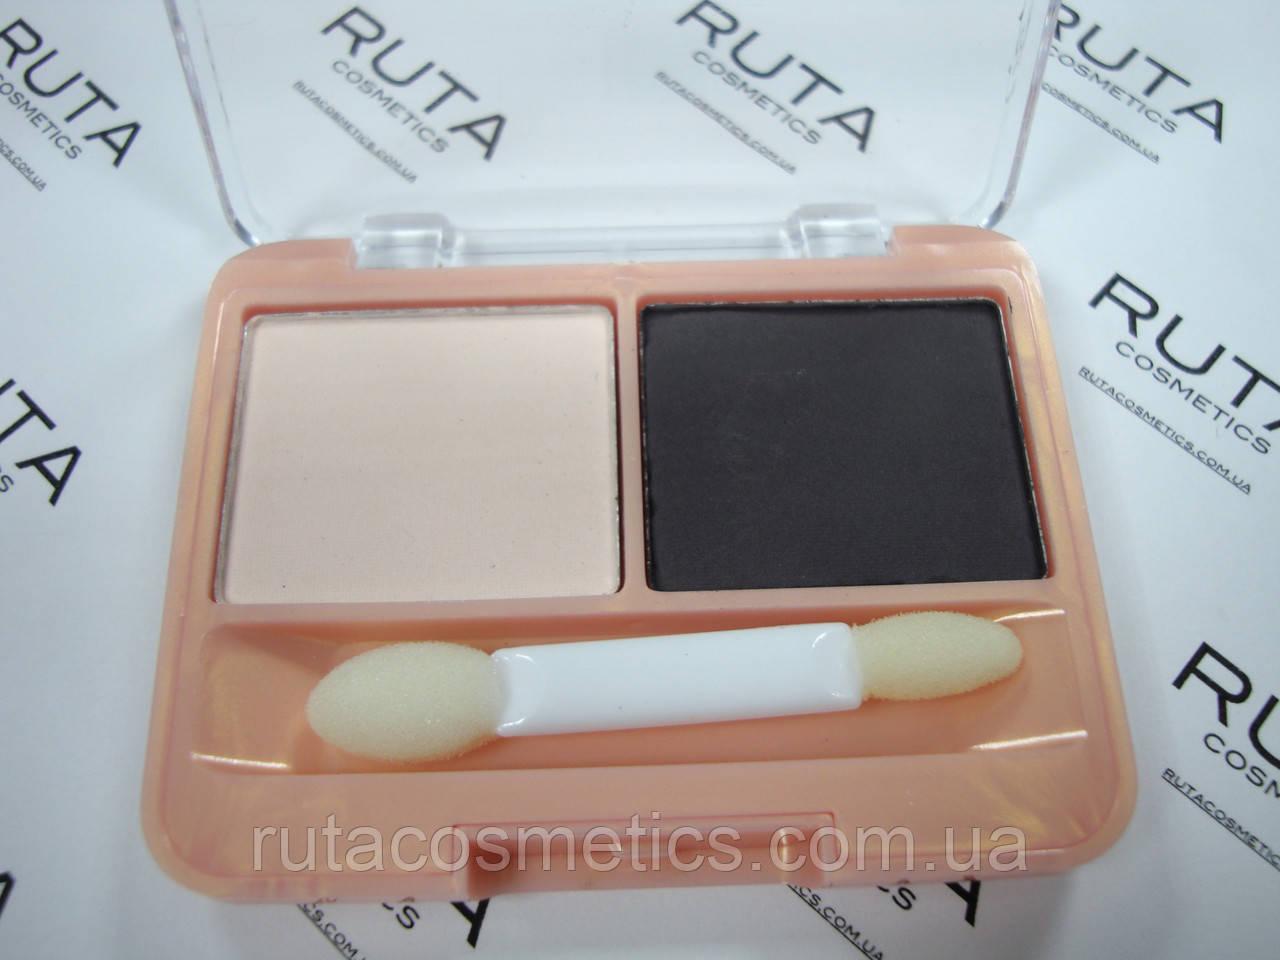 Parisa Cosmetics тени матовые двойные (02)